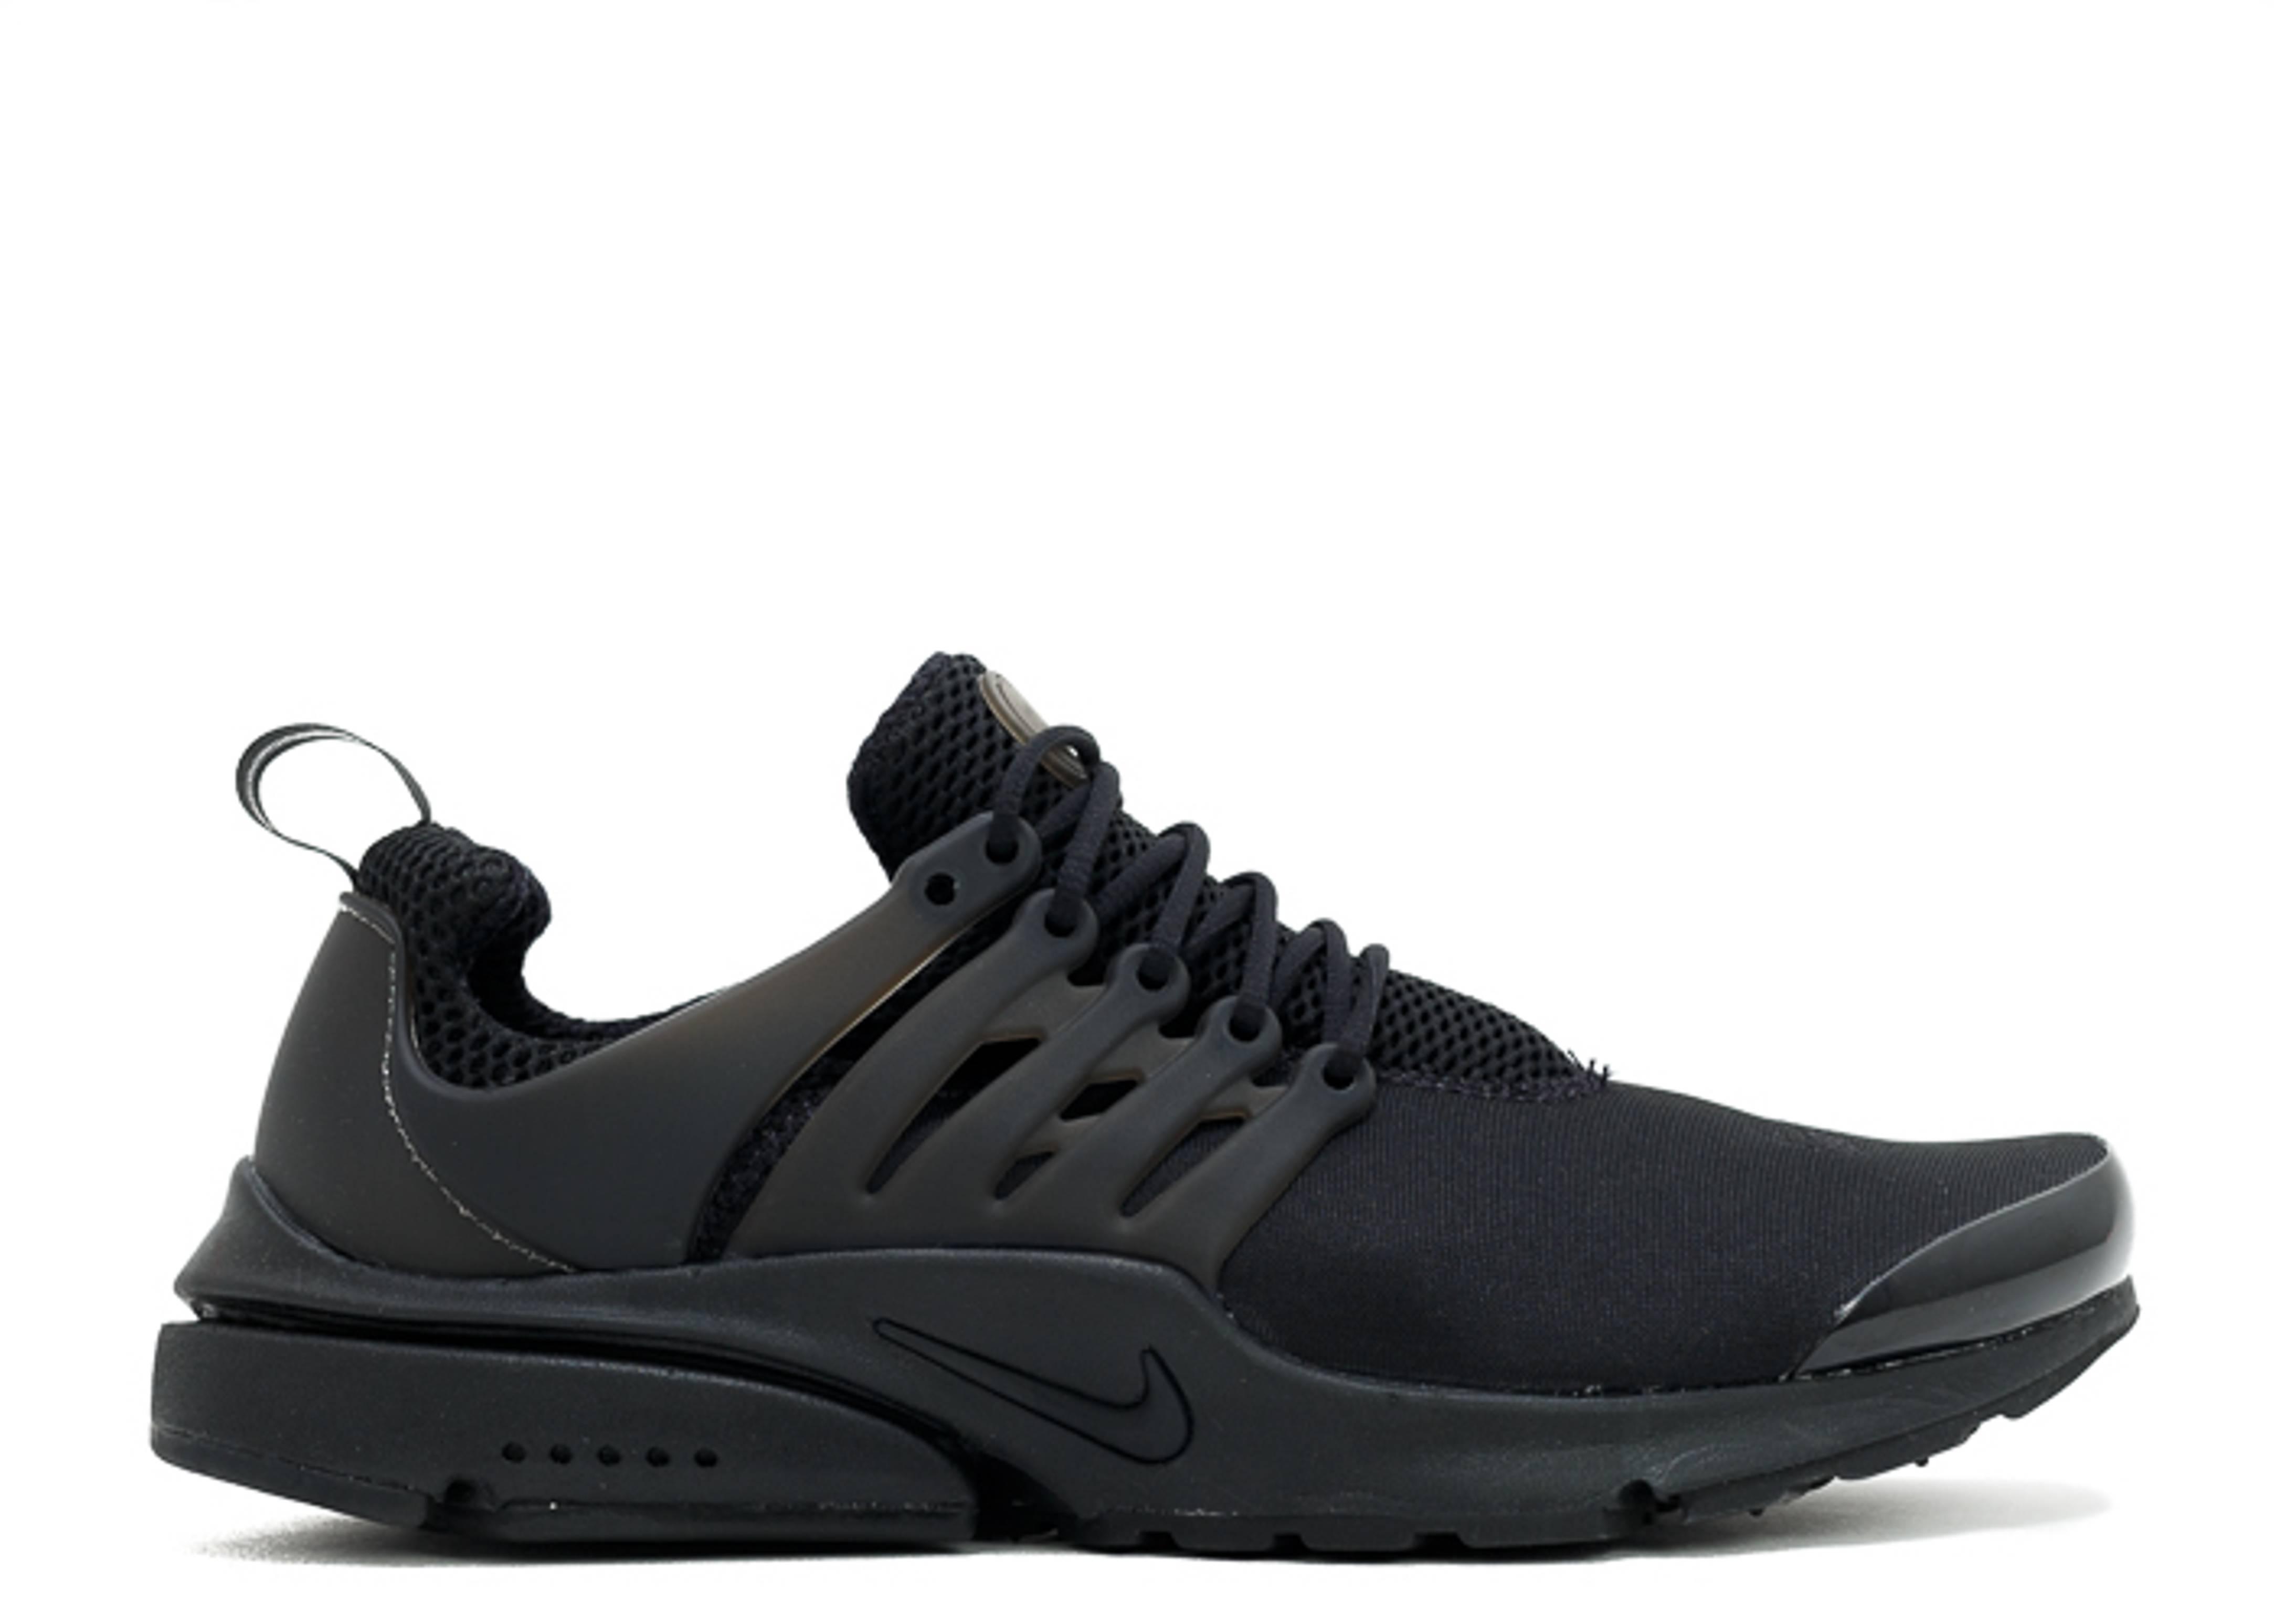 Nike Slides Shoe Show